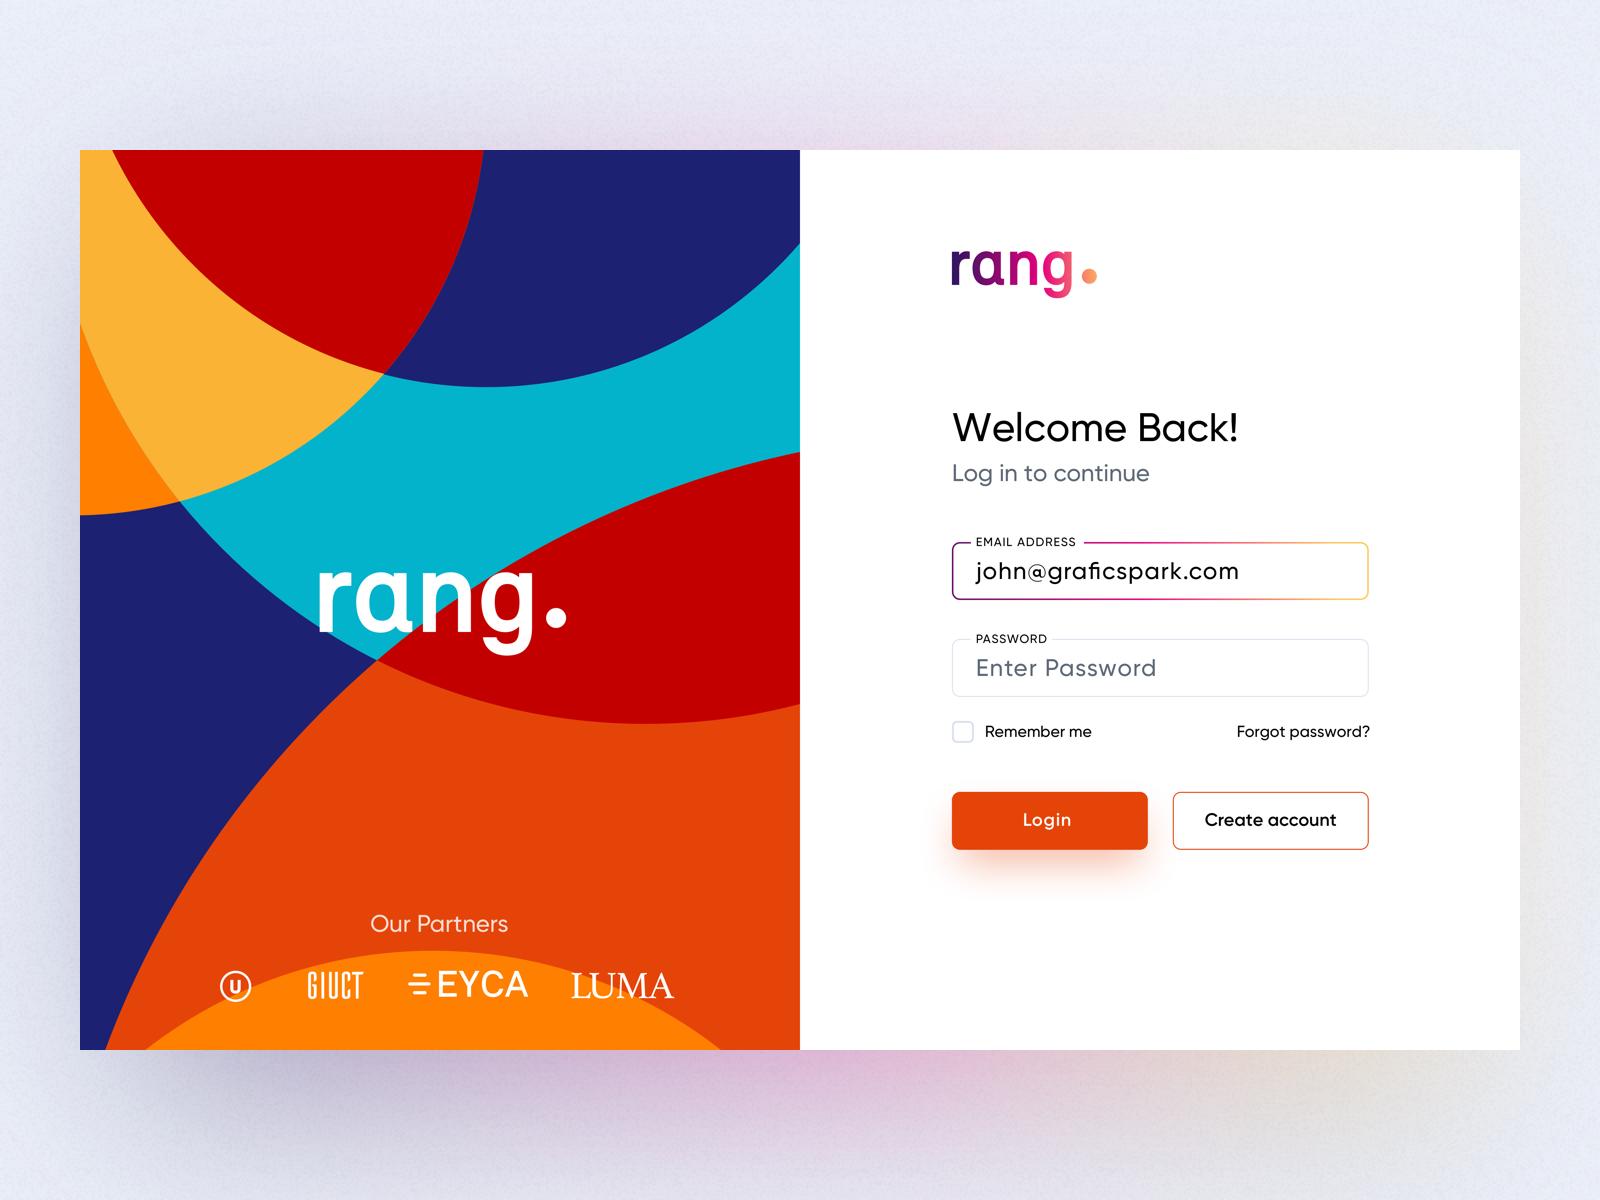 Rang Login UI | Onboarding | Rings, Web design inspiration